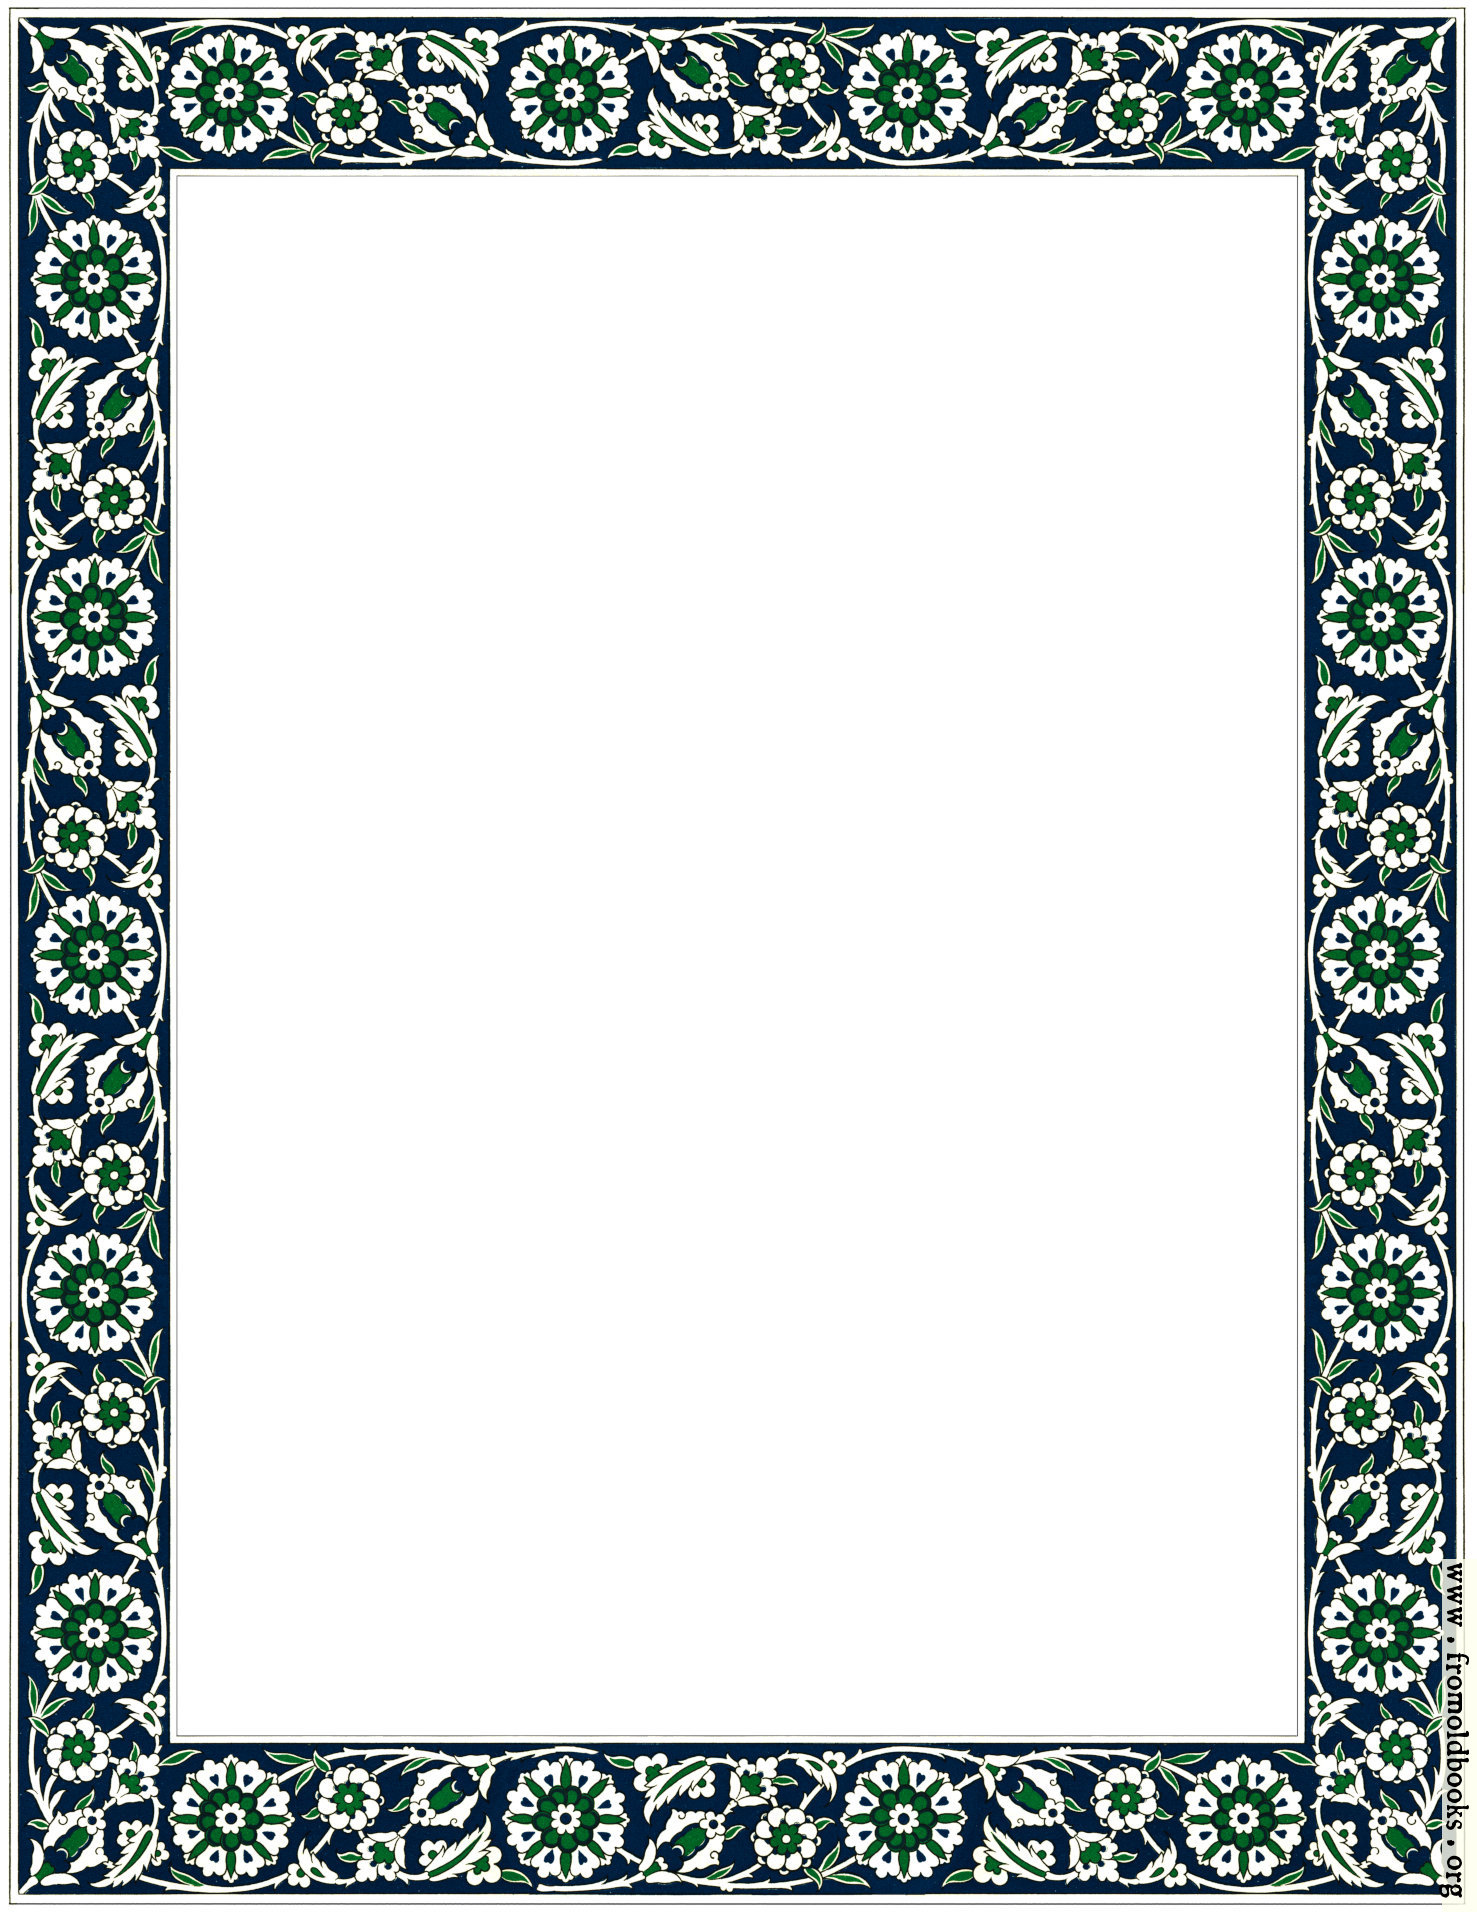 [Picture: Fig. 57. No. 6.—Persian Ceramic Tile Border]